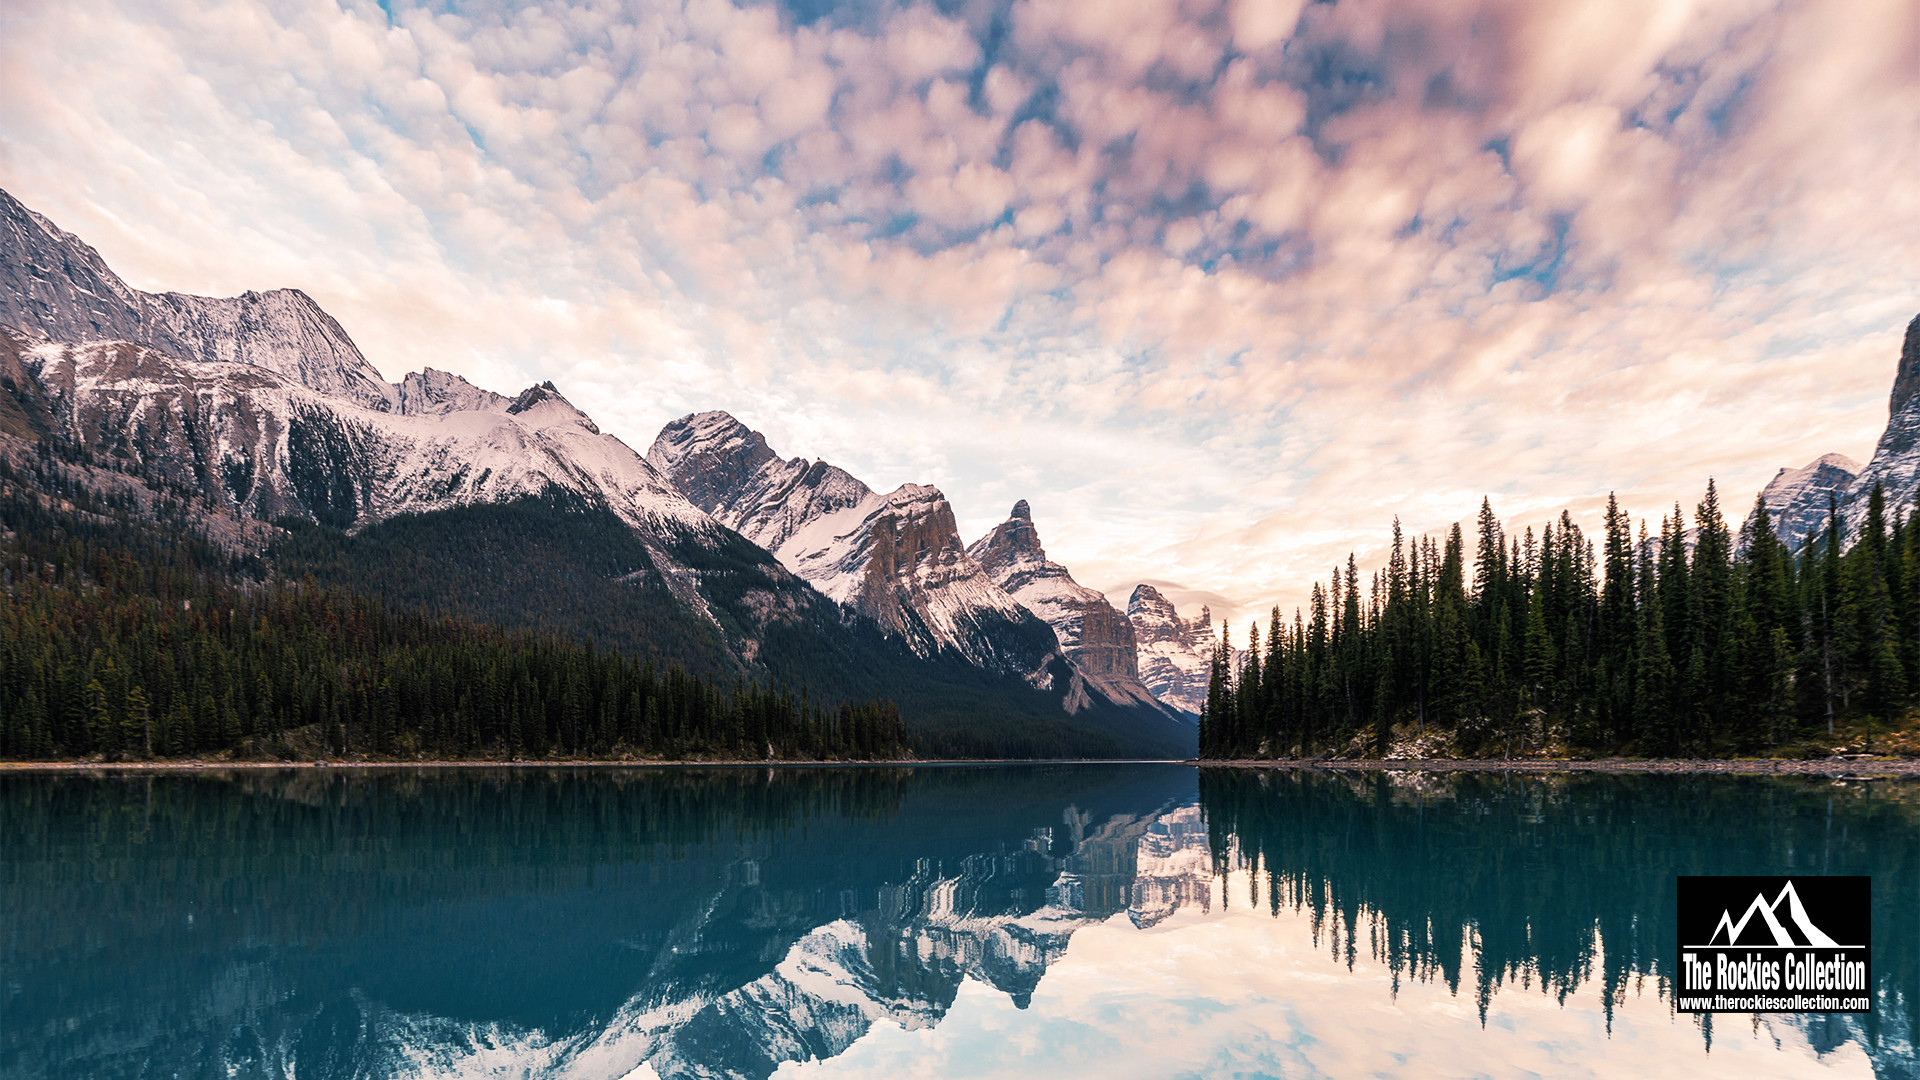 MALIGNE LAKE - JASPER CANADIAN ROCKIES